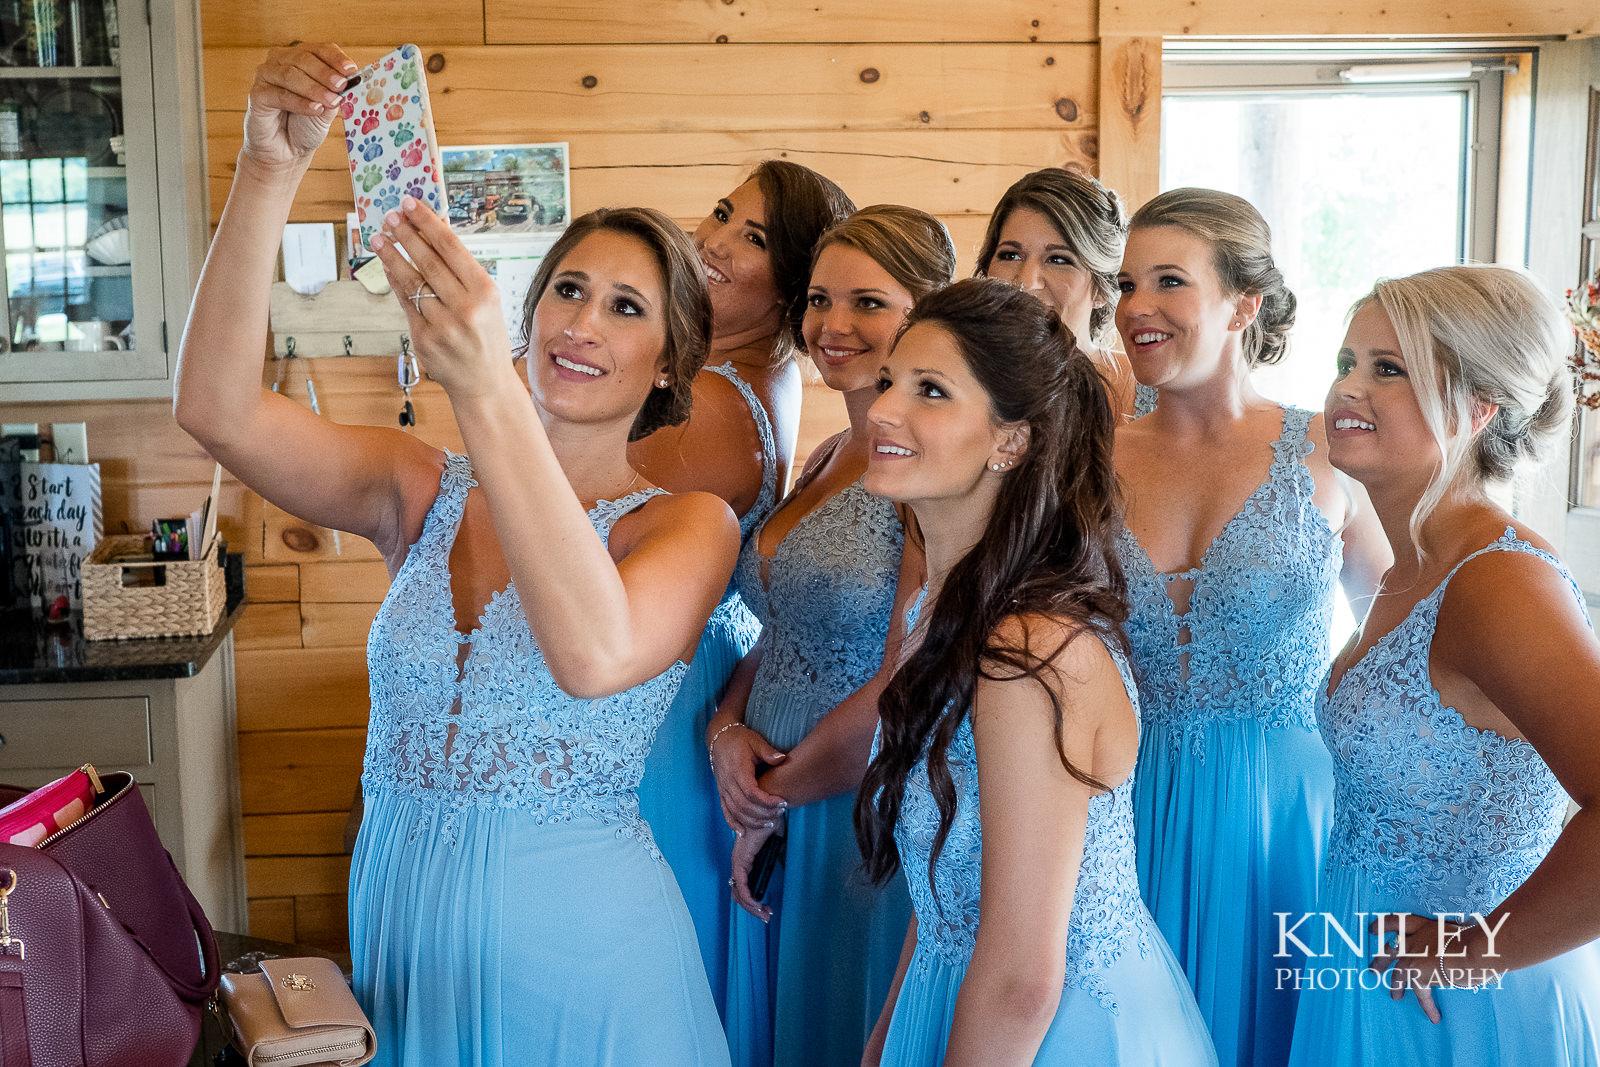 035 - Buffalo NY wedding - Preparation pictures - XT2A6776.jpg